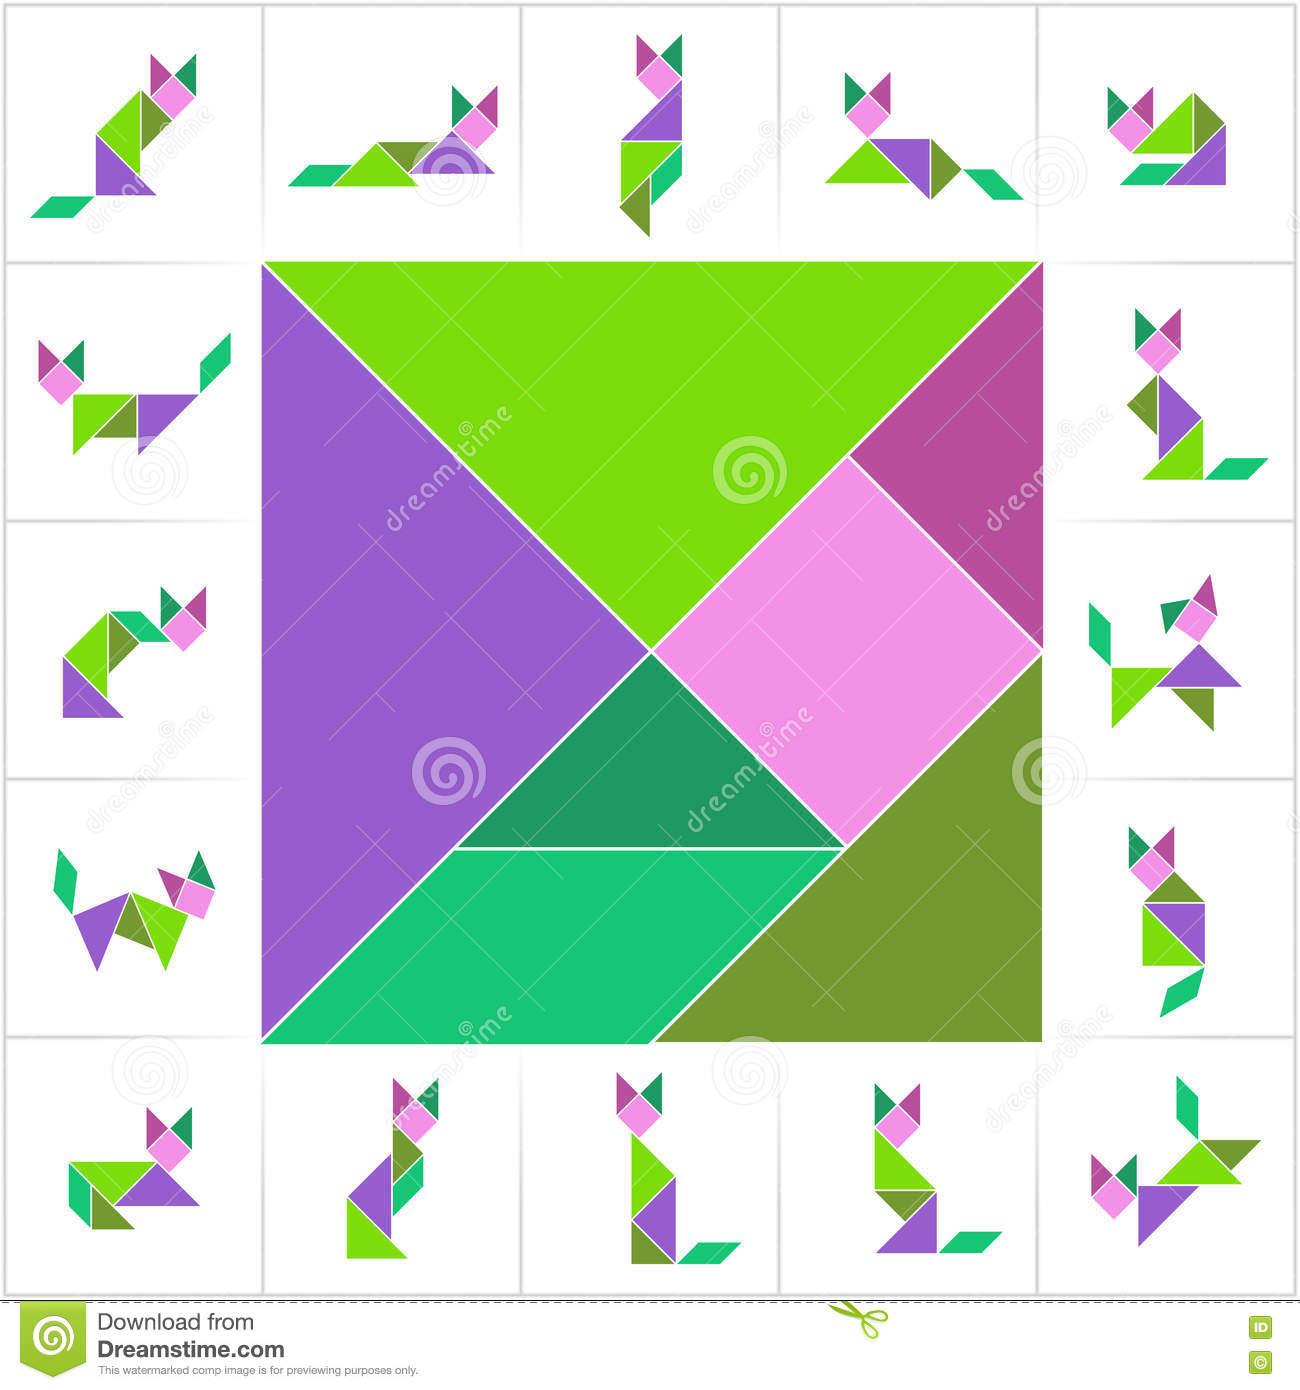 Tangram Set, Cats Stock Vector. Illustration Of Card - 72477142 concernant Tangram Chat